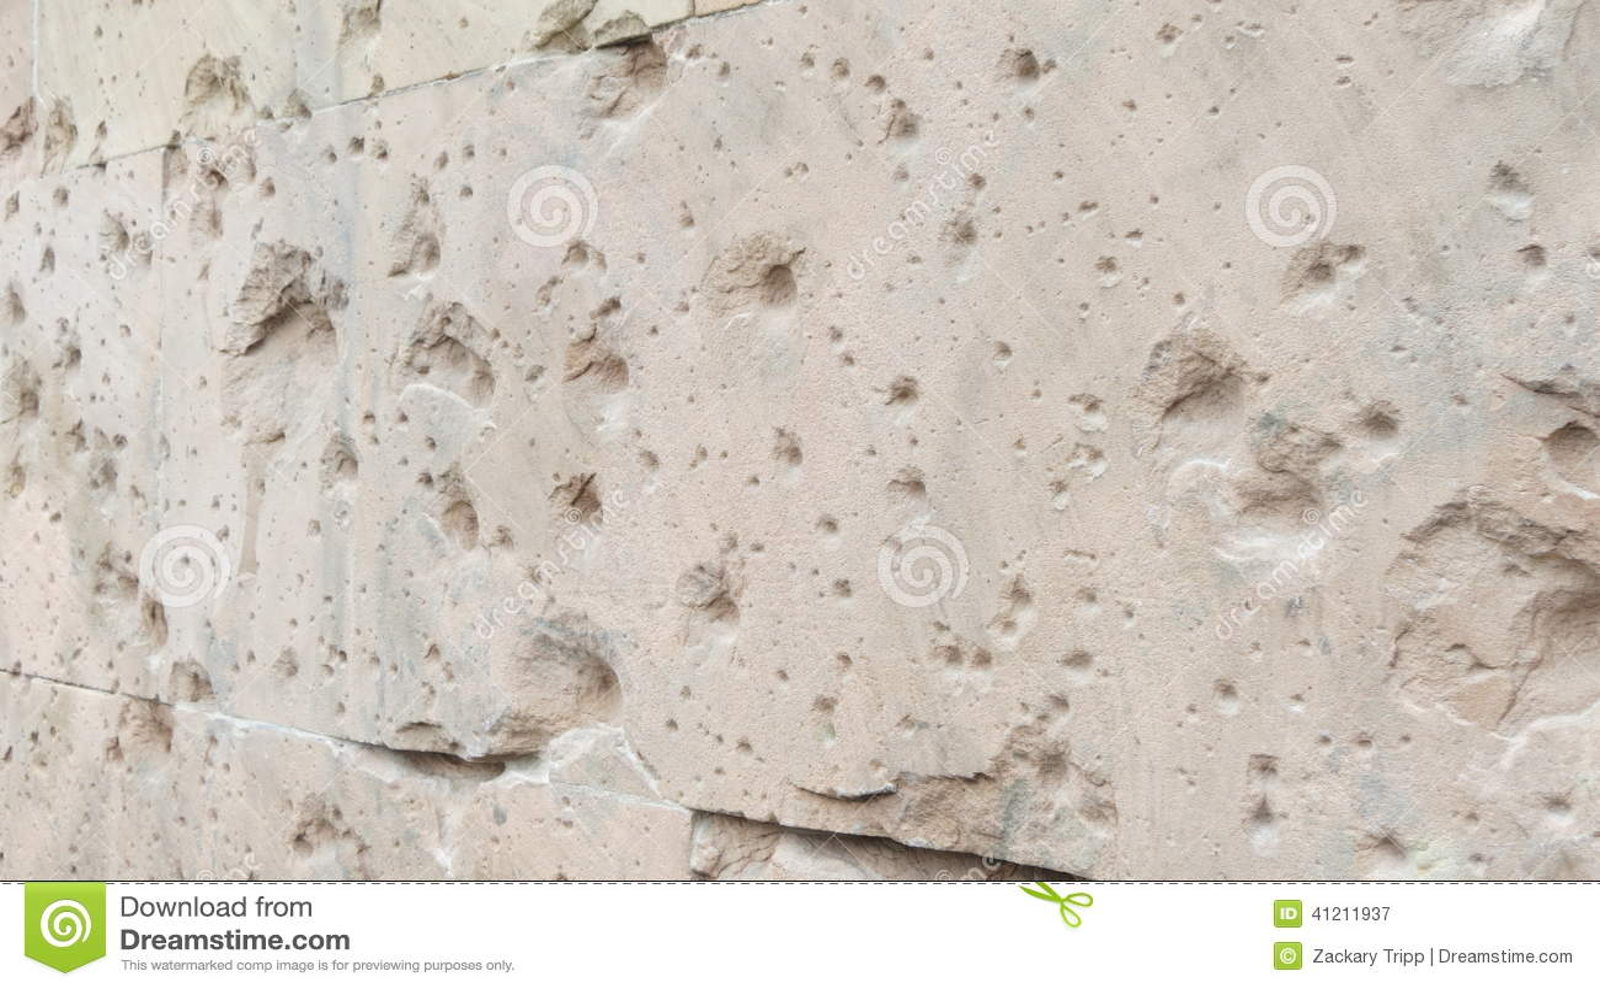 Berlin Building Bullet Holes Stock Photo Image 41211937